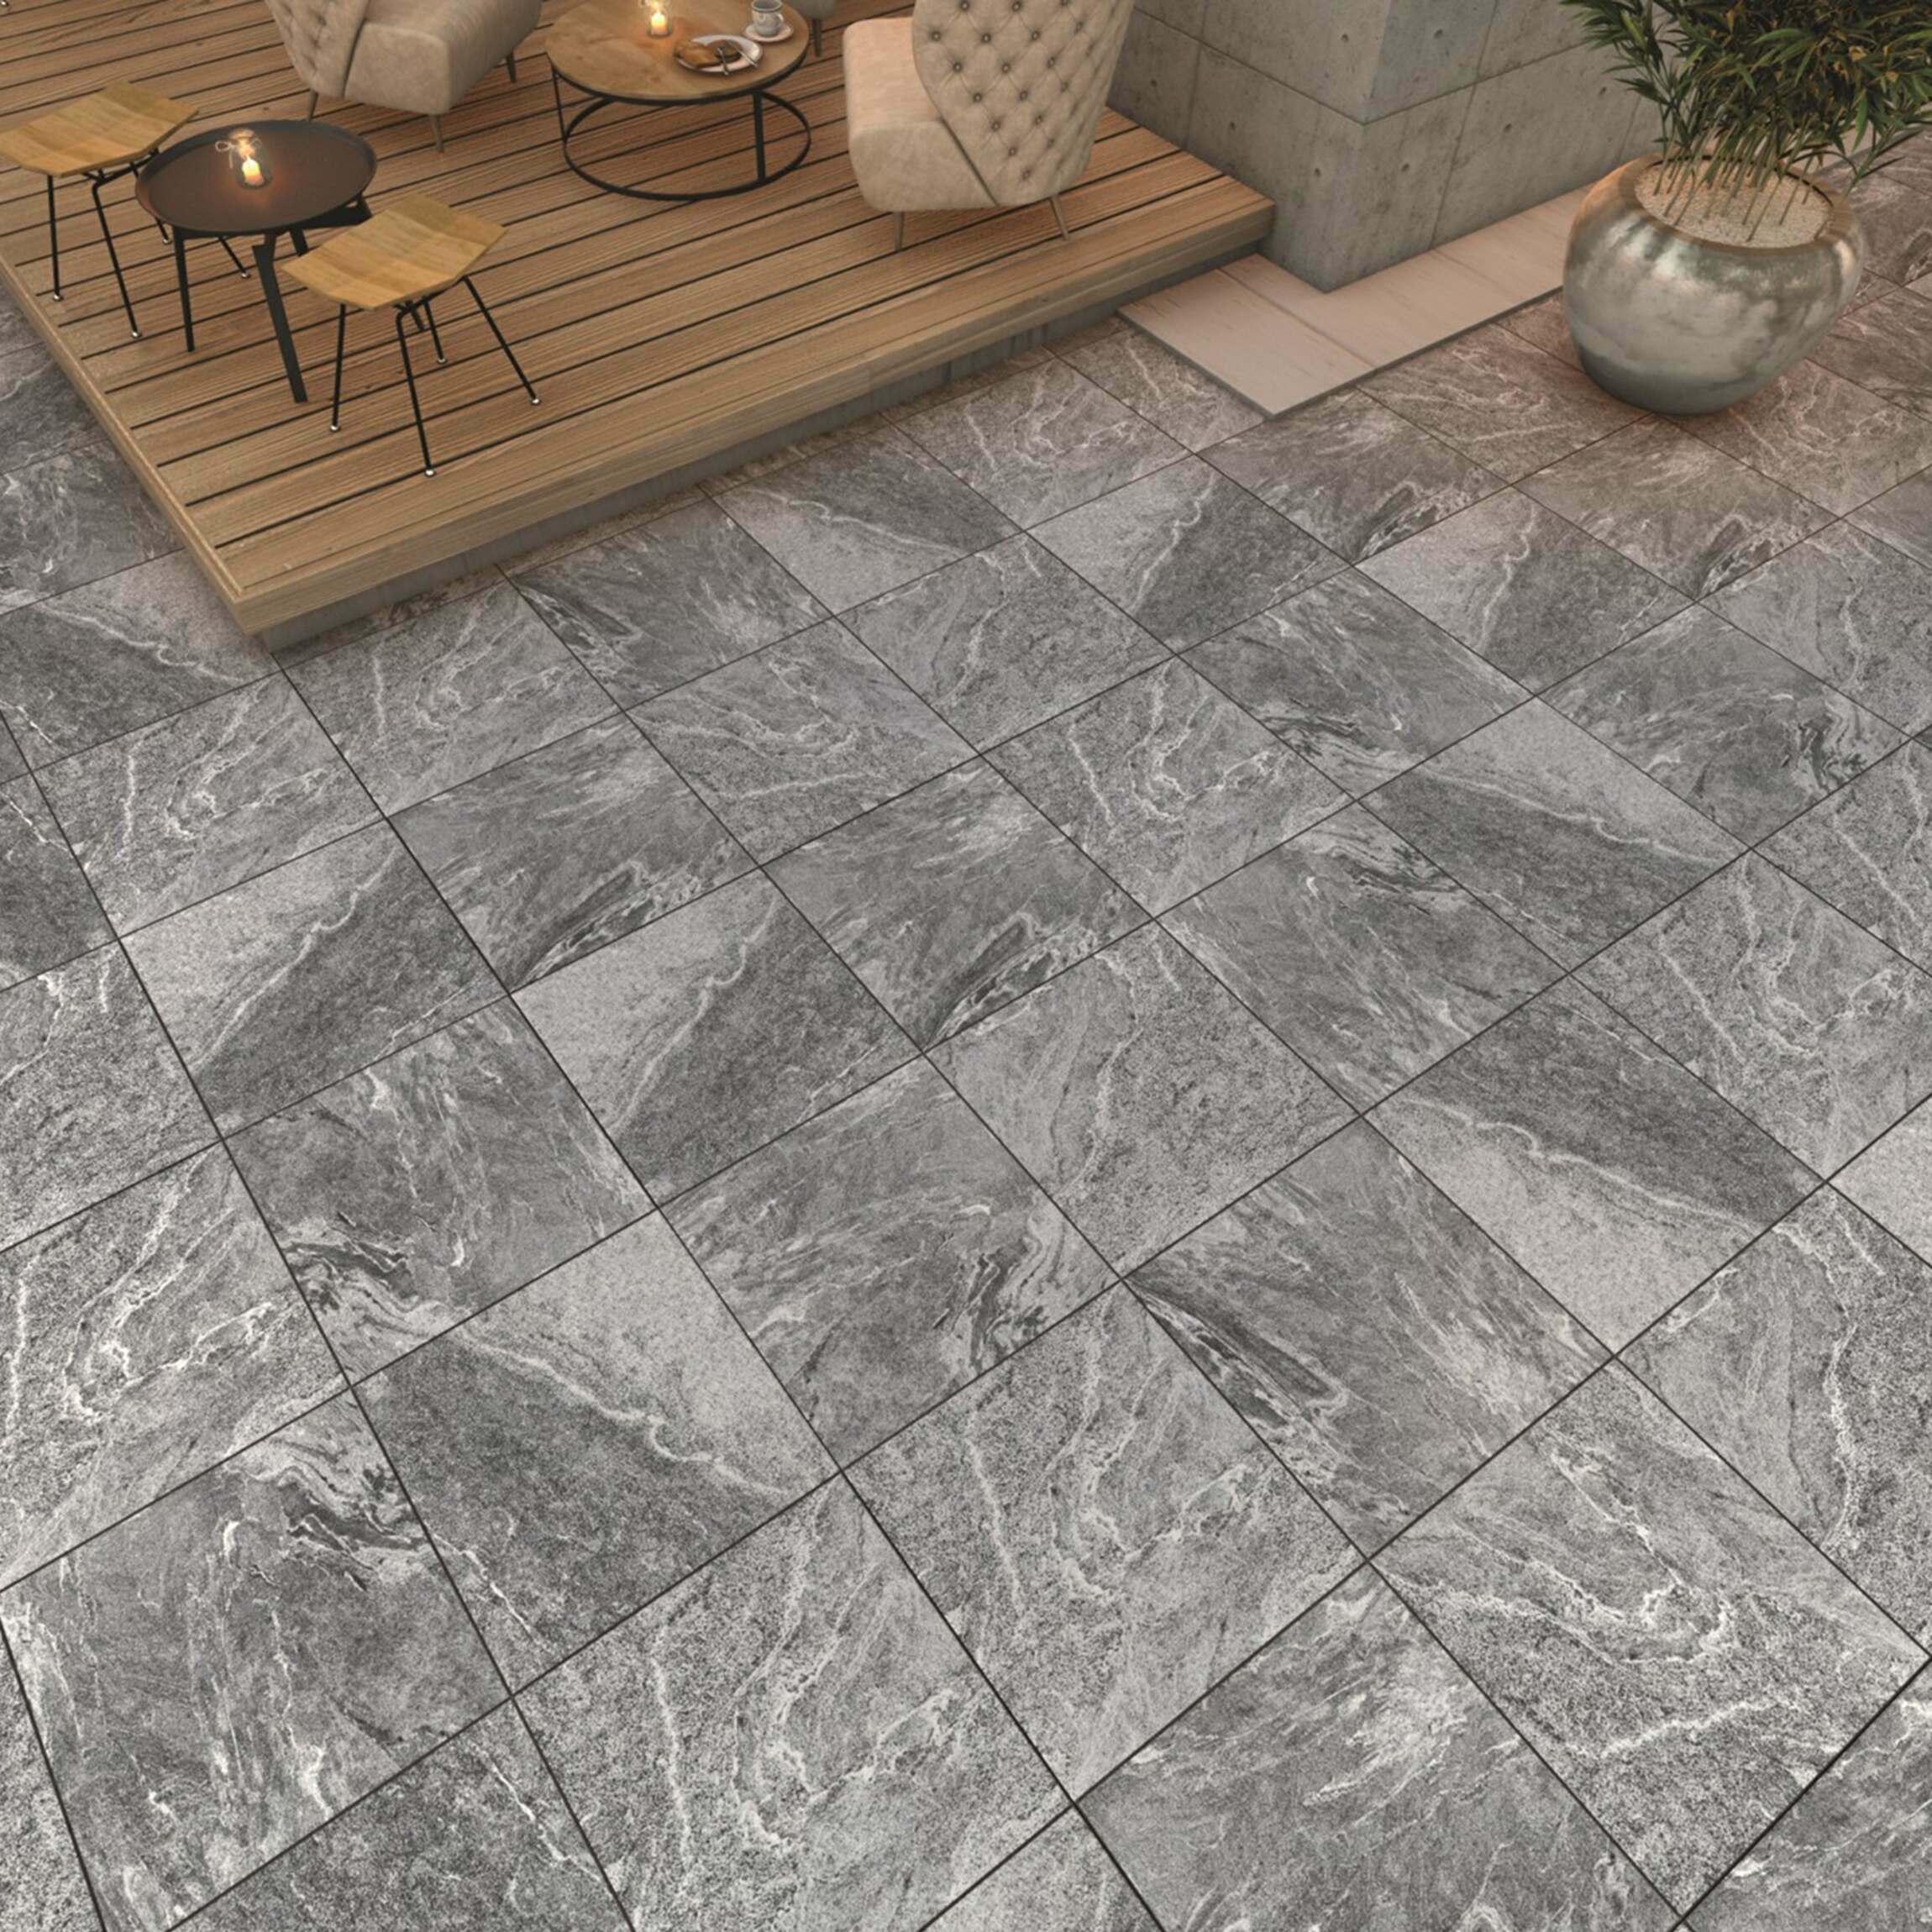 Enstone Anthracite Outdoor Slab Tiles 600x600